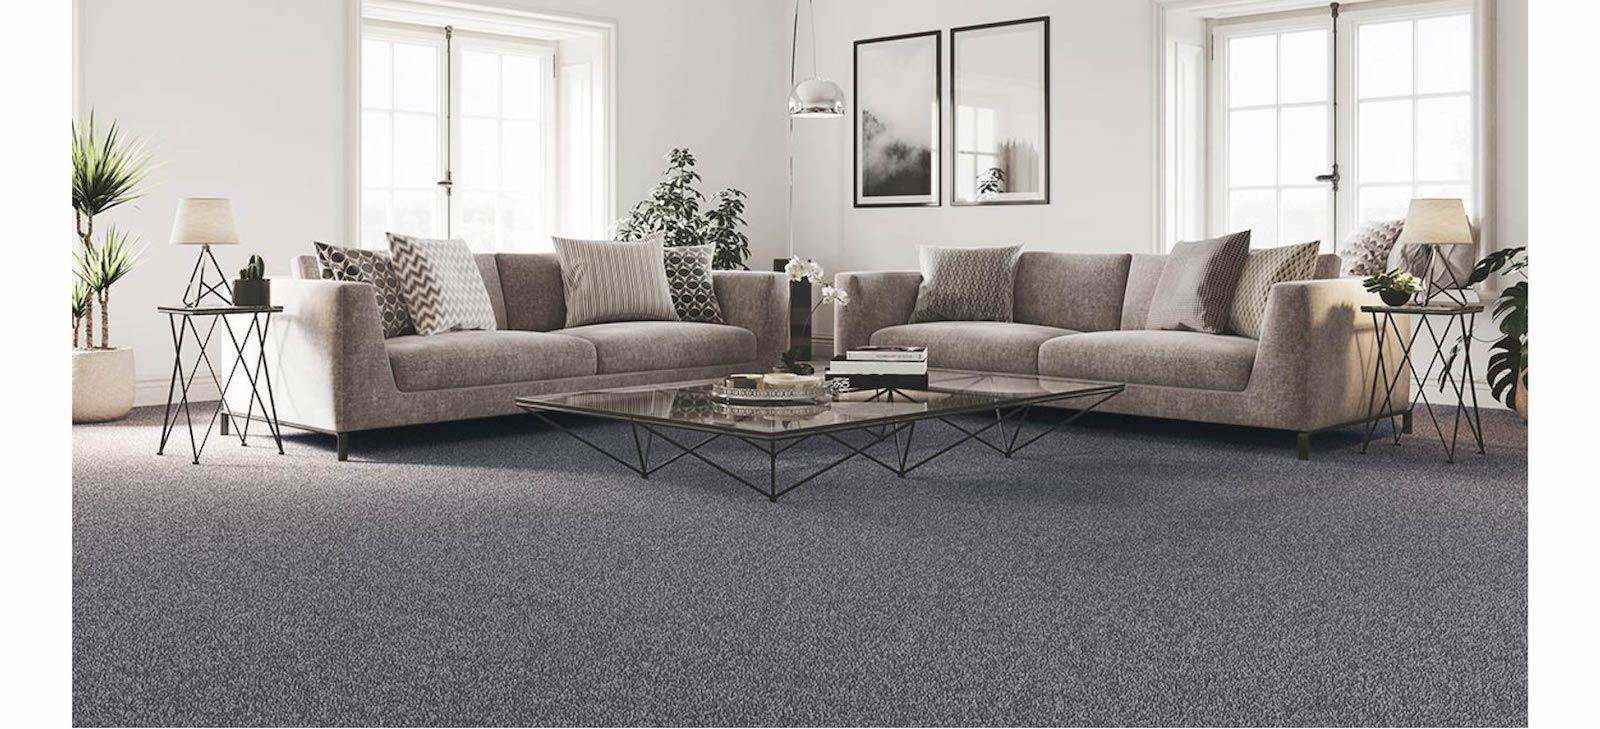 Dark grey carpet living room